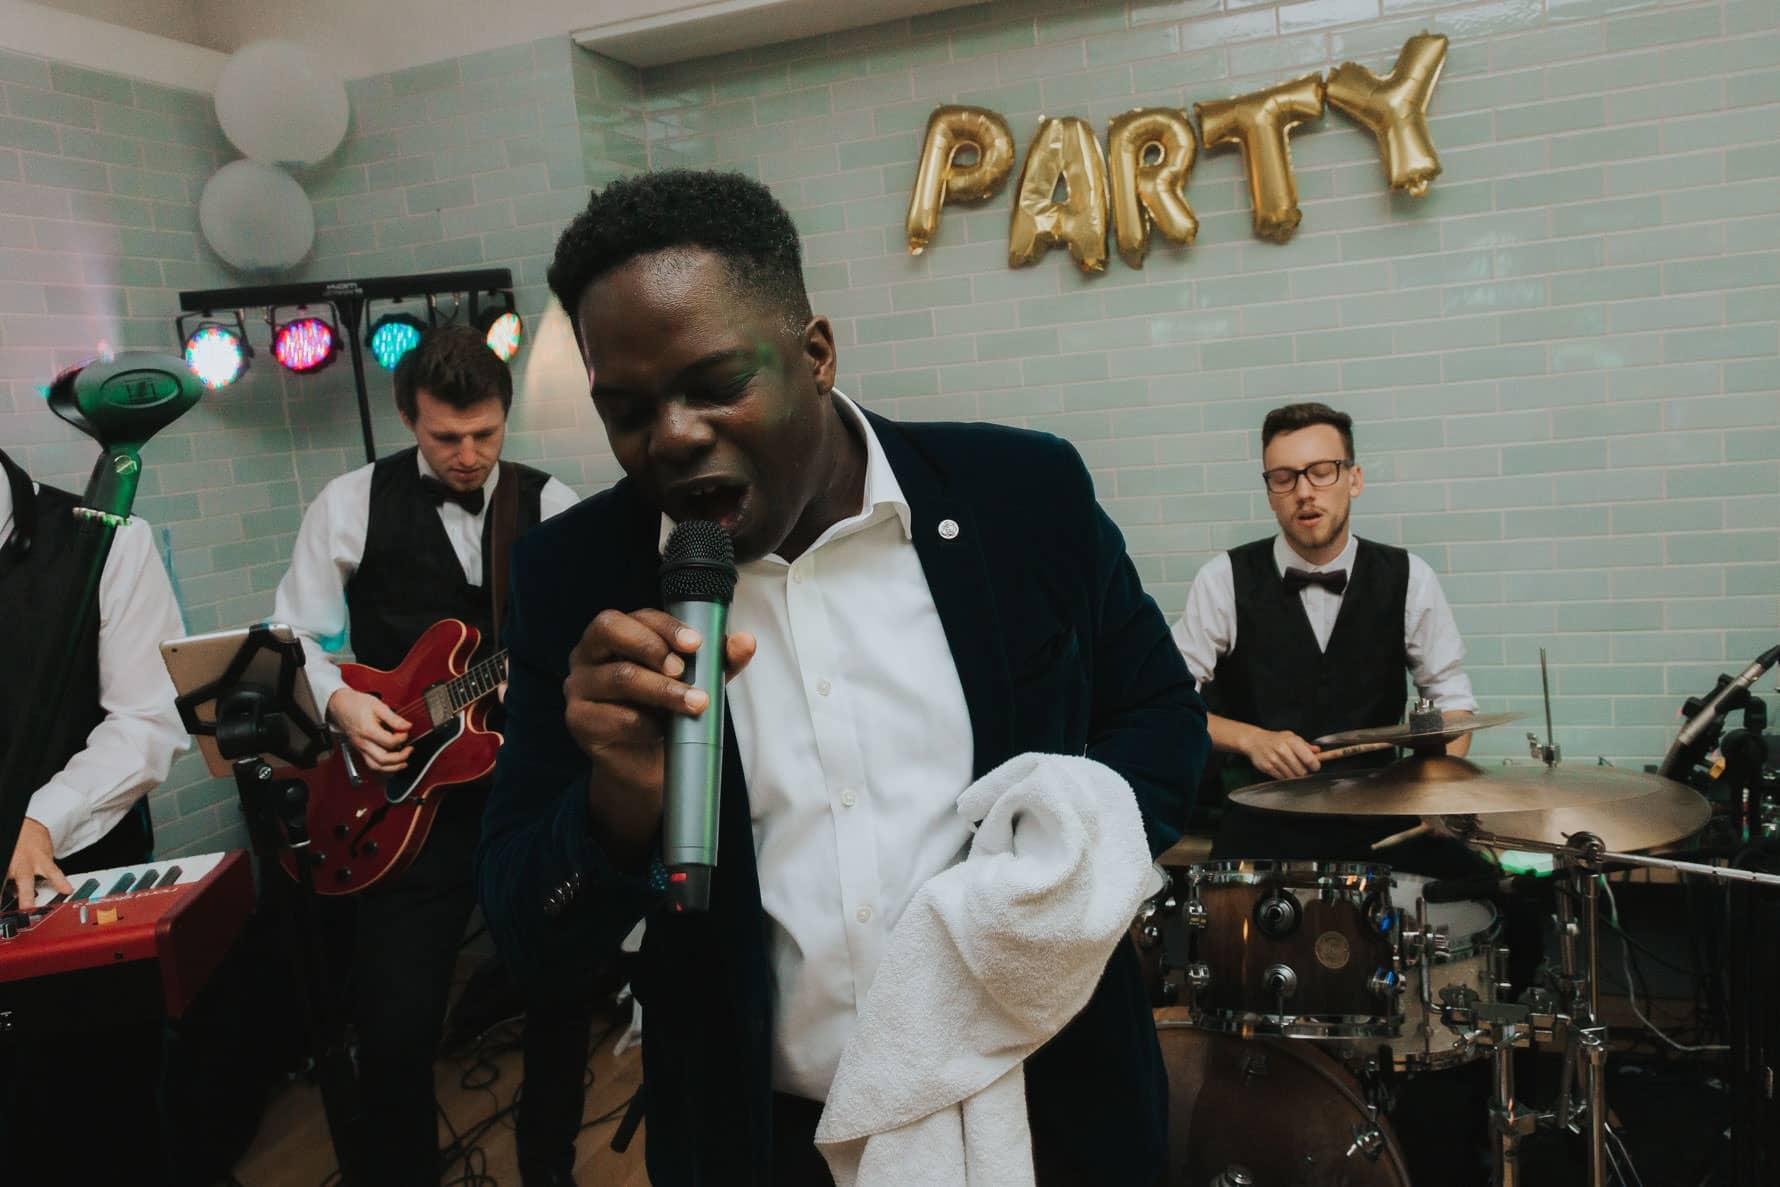 Lead singer of a wedding band at a wedding reception